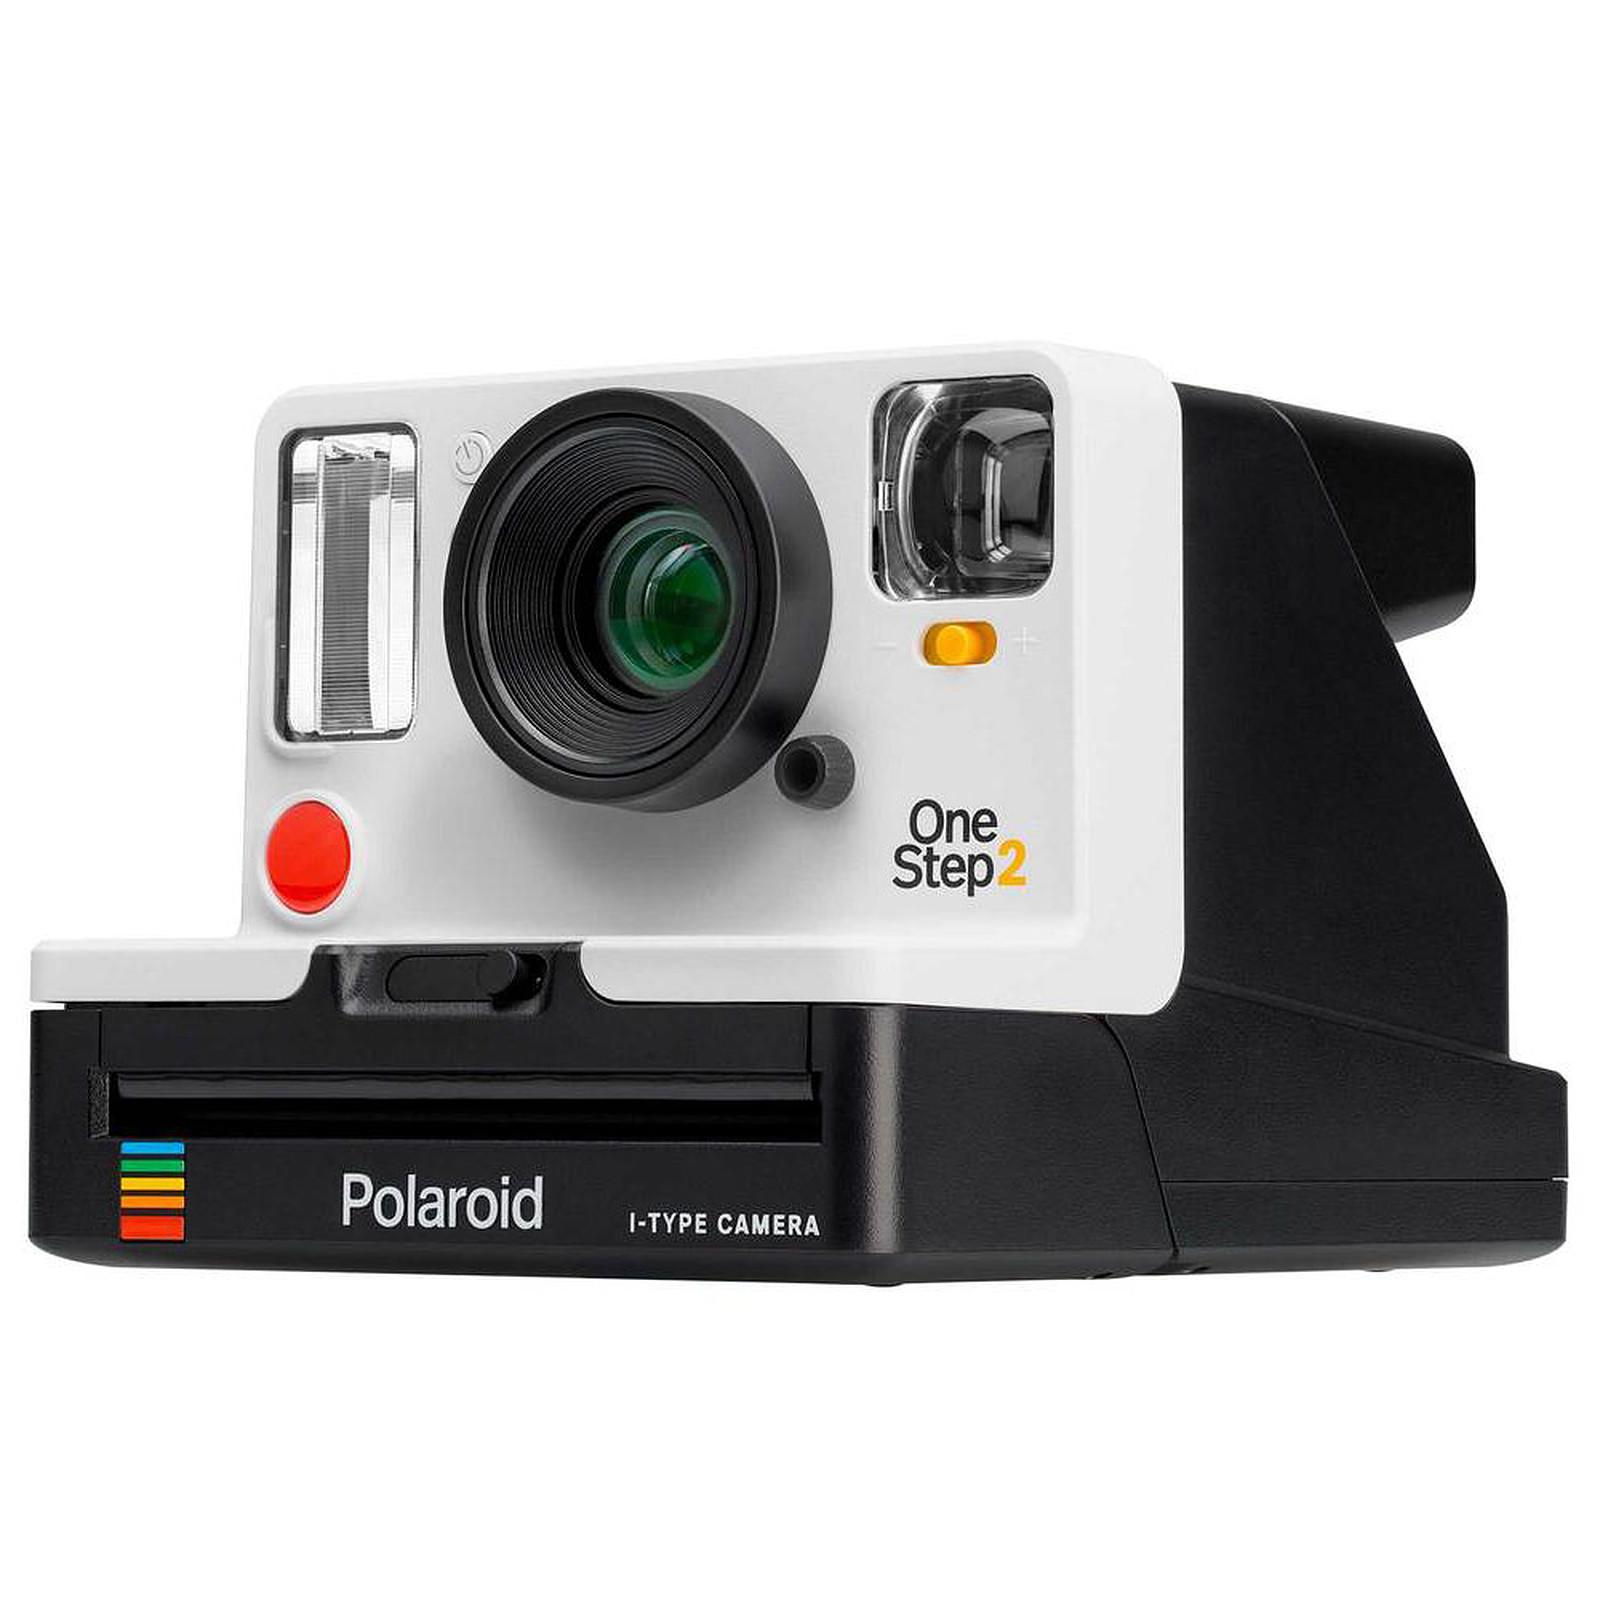 ... instantánea con flash y temporizador automático · Cámara compacta ·  Opiniones sobre Polaroid OneStep 2 VF Blanco ... 82e0842c5a